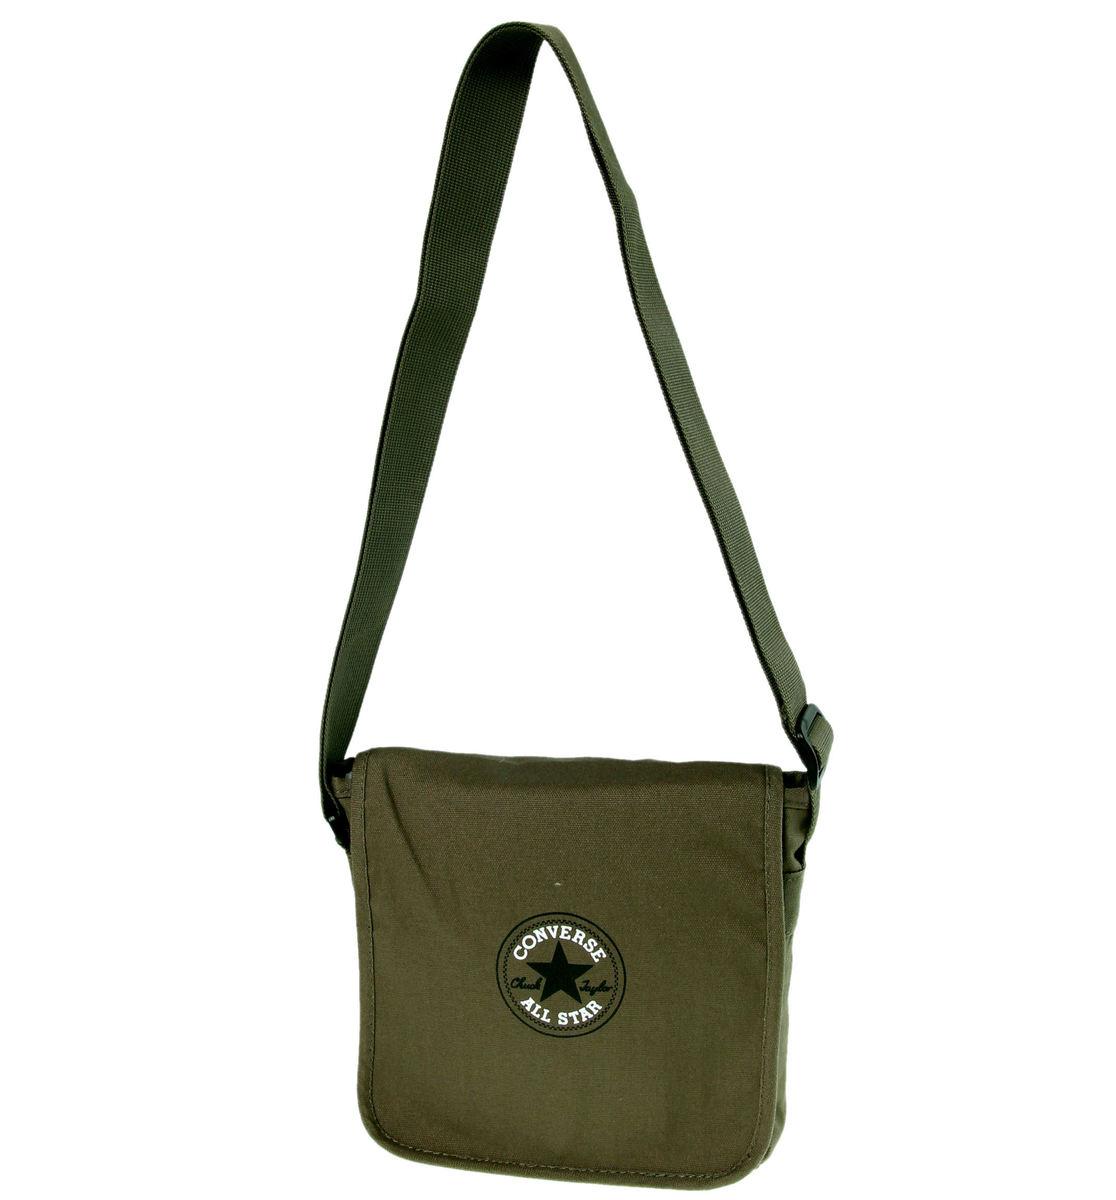 taška malá (kabelka) CONVERSE - Small Flap - GREEN - 410892-302